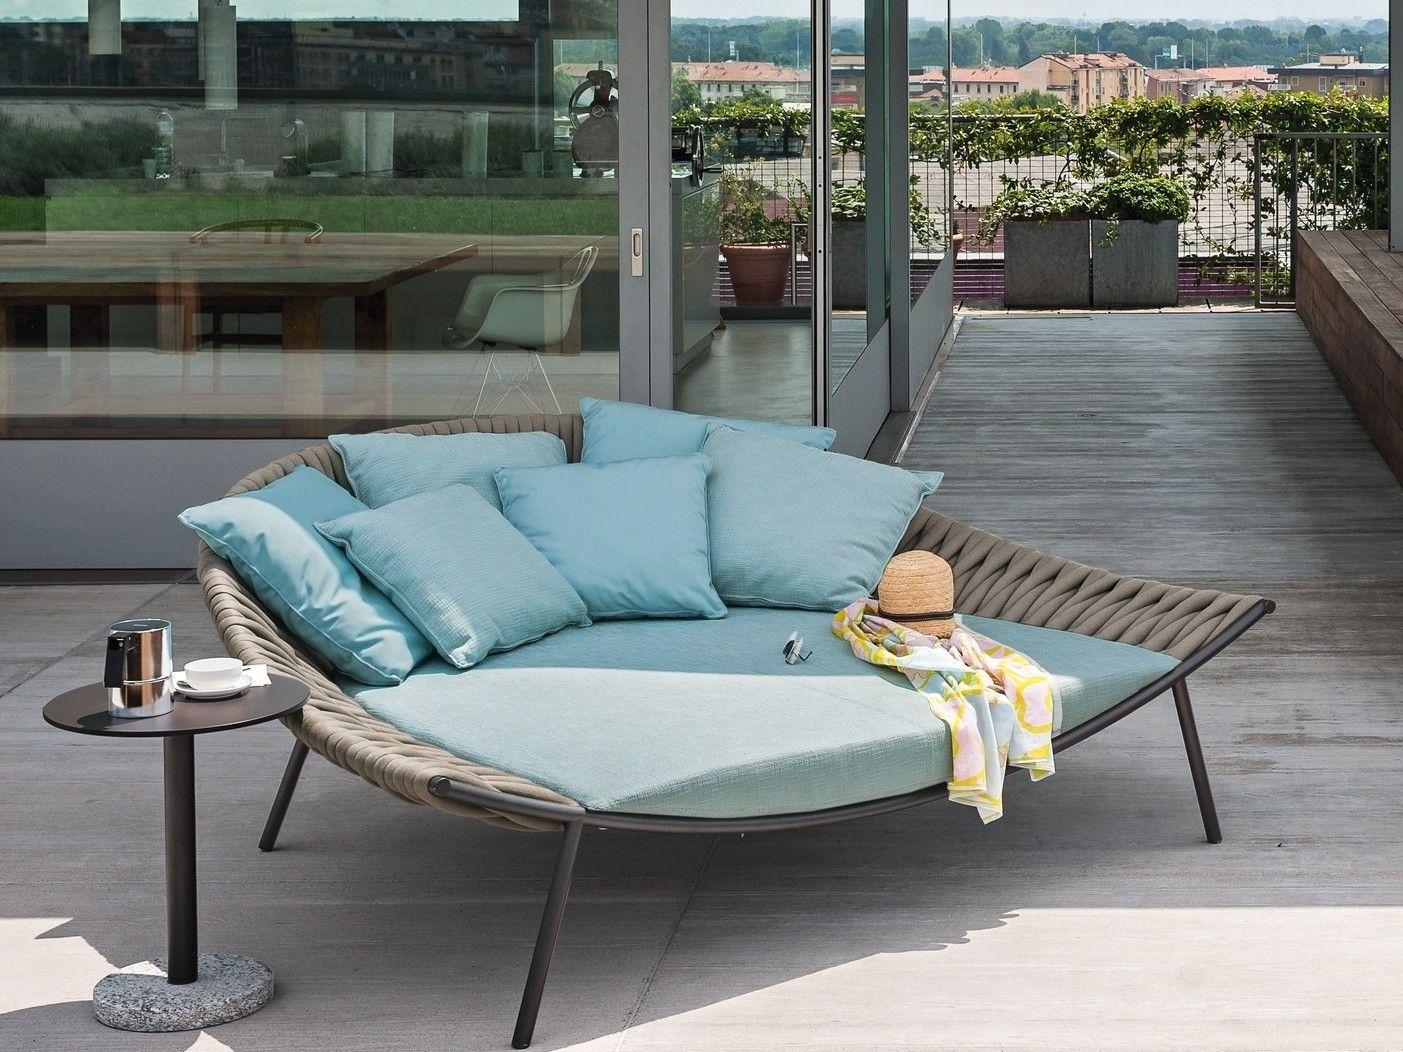 Genial Fabric Garden Bed ARENA By RODA